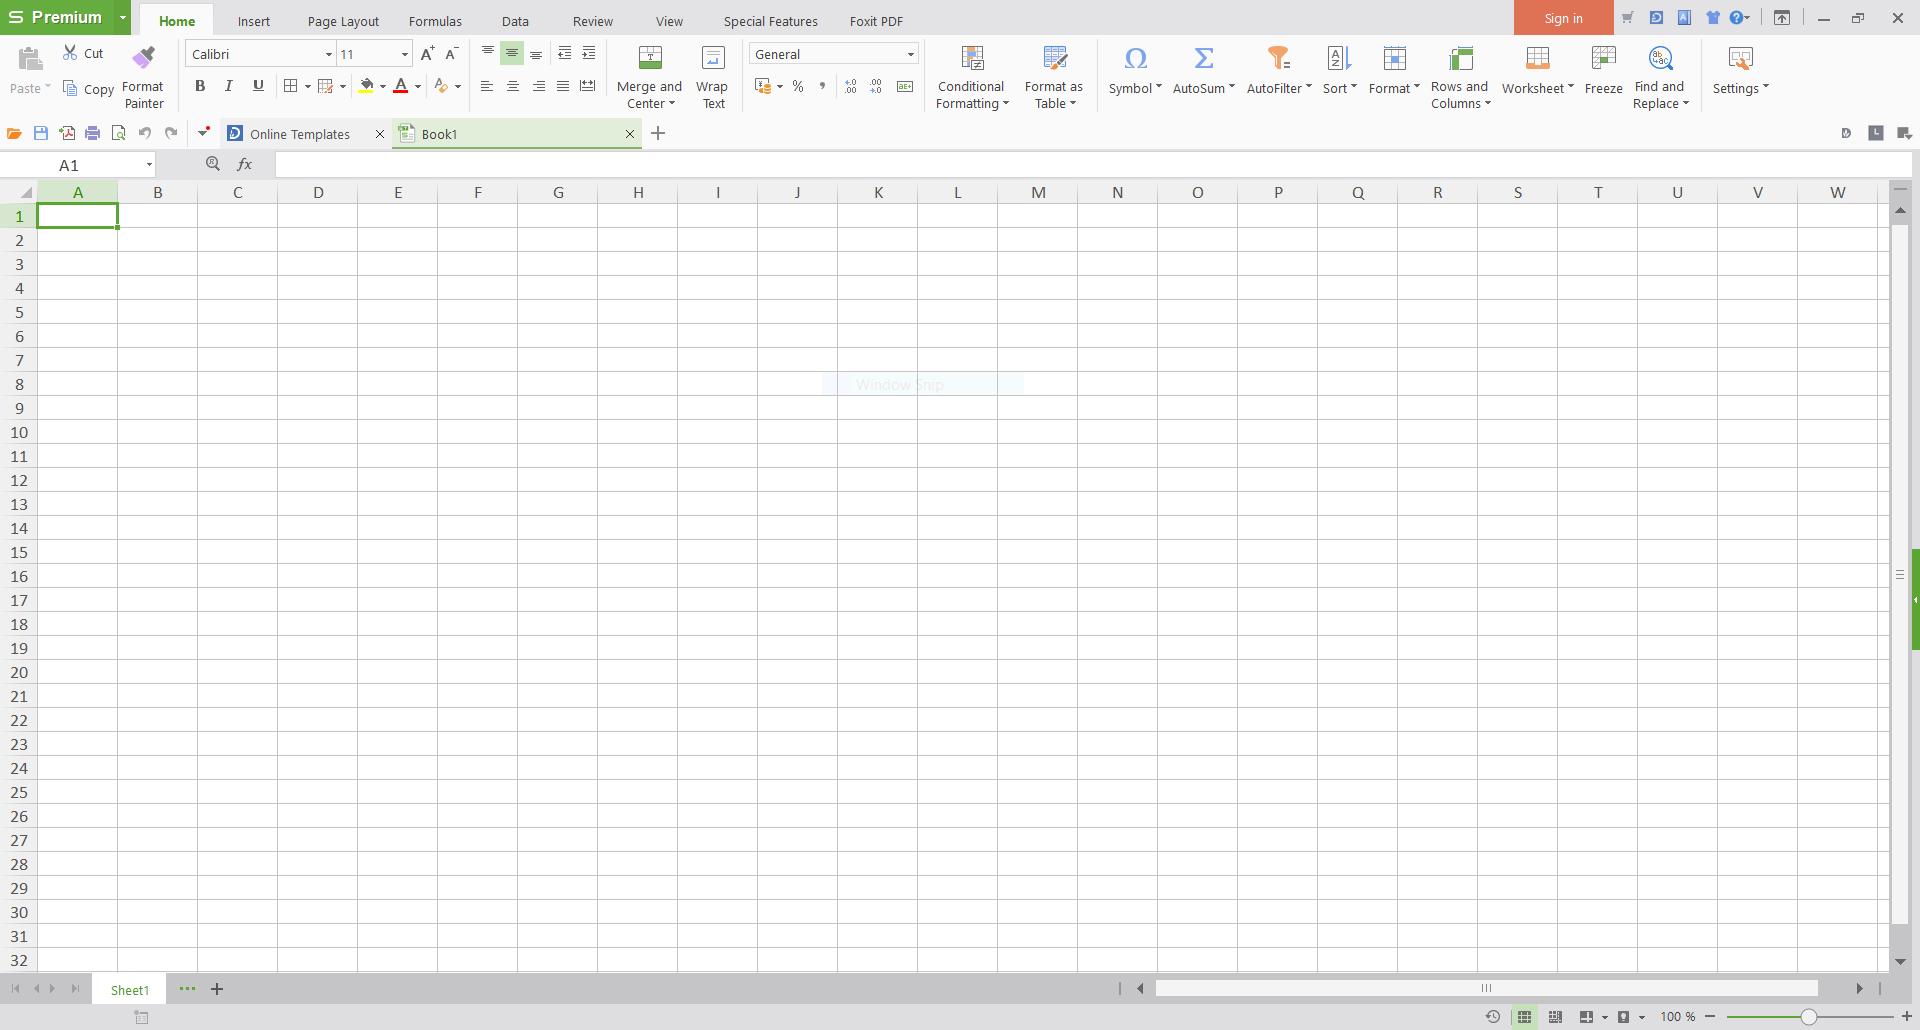 Screenshot of WPS Office 2016 Spreadsheet (Windows 10